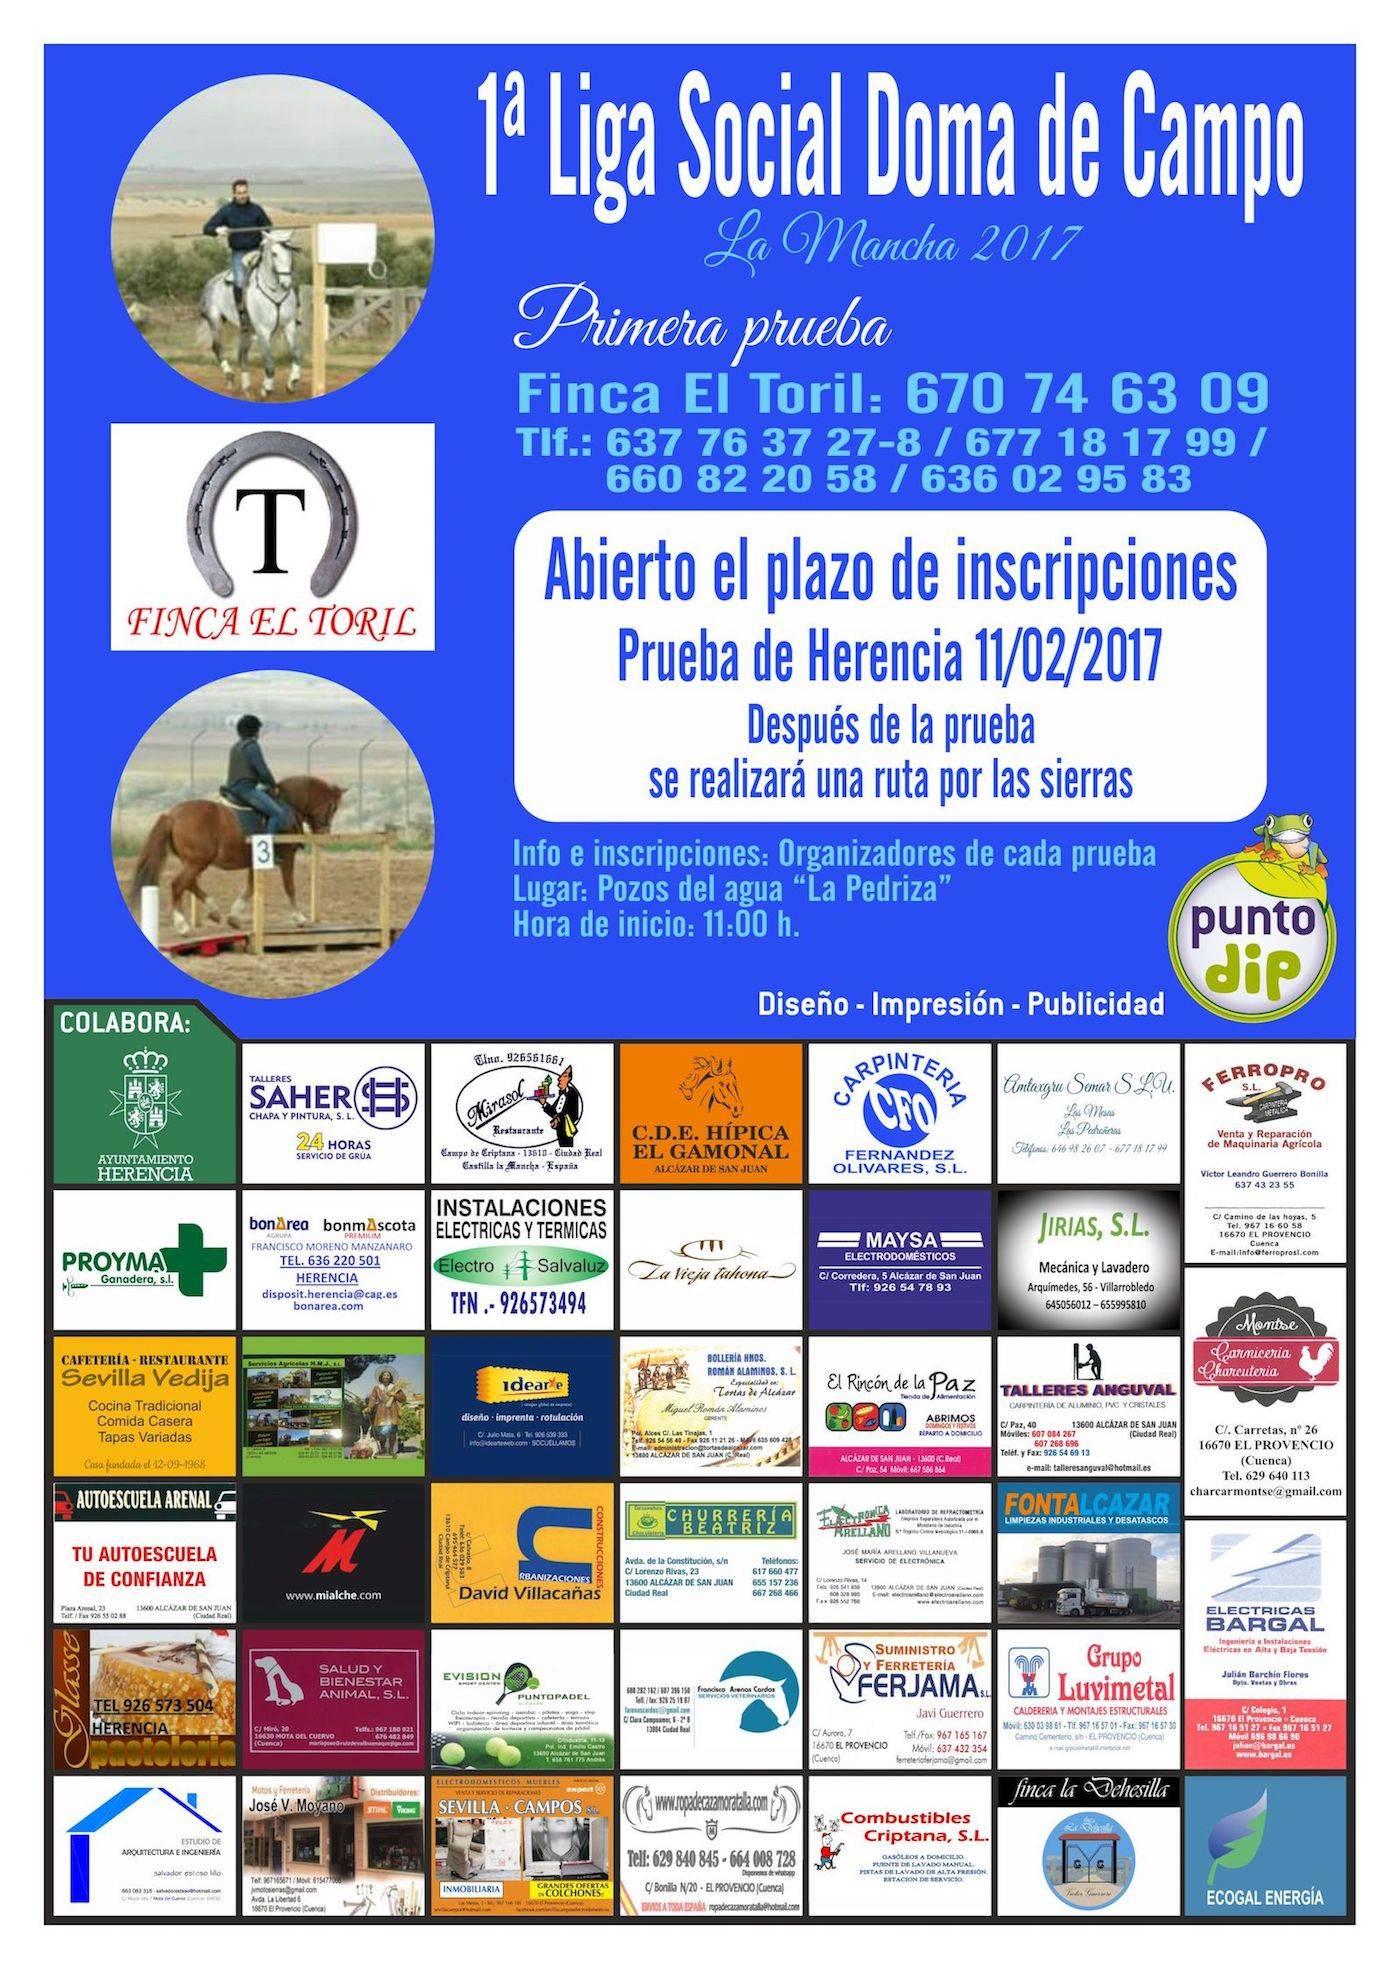 cartel primera doma de campo herencia - Primera Liga Social Doma de Campo en Herencia